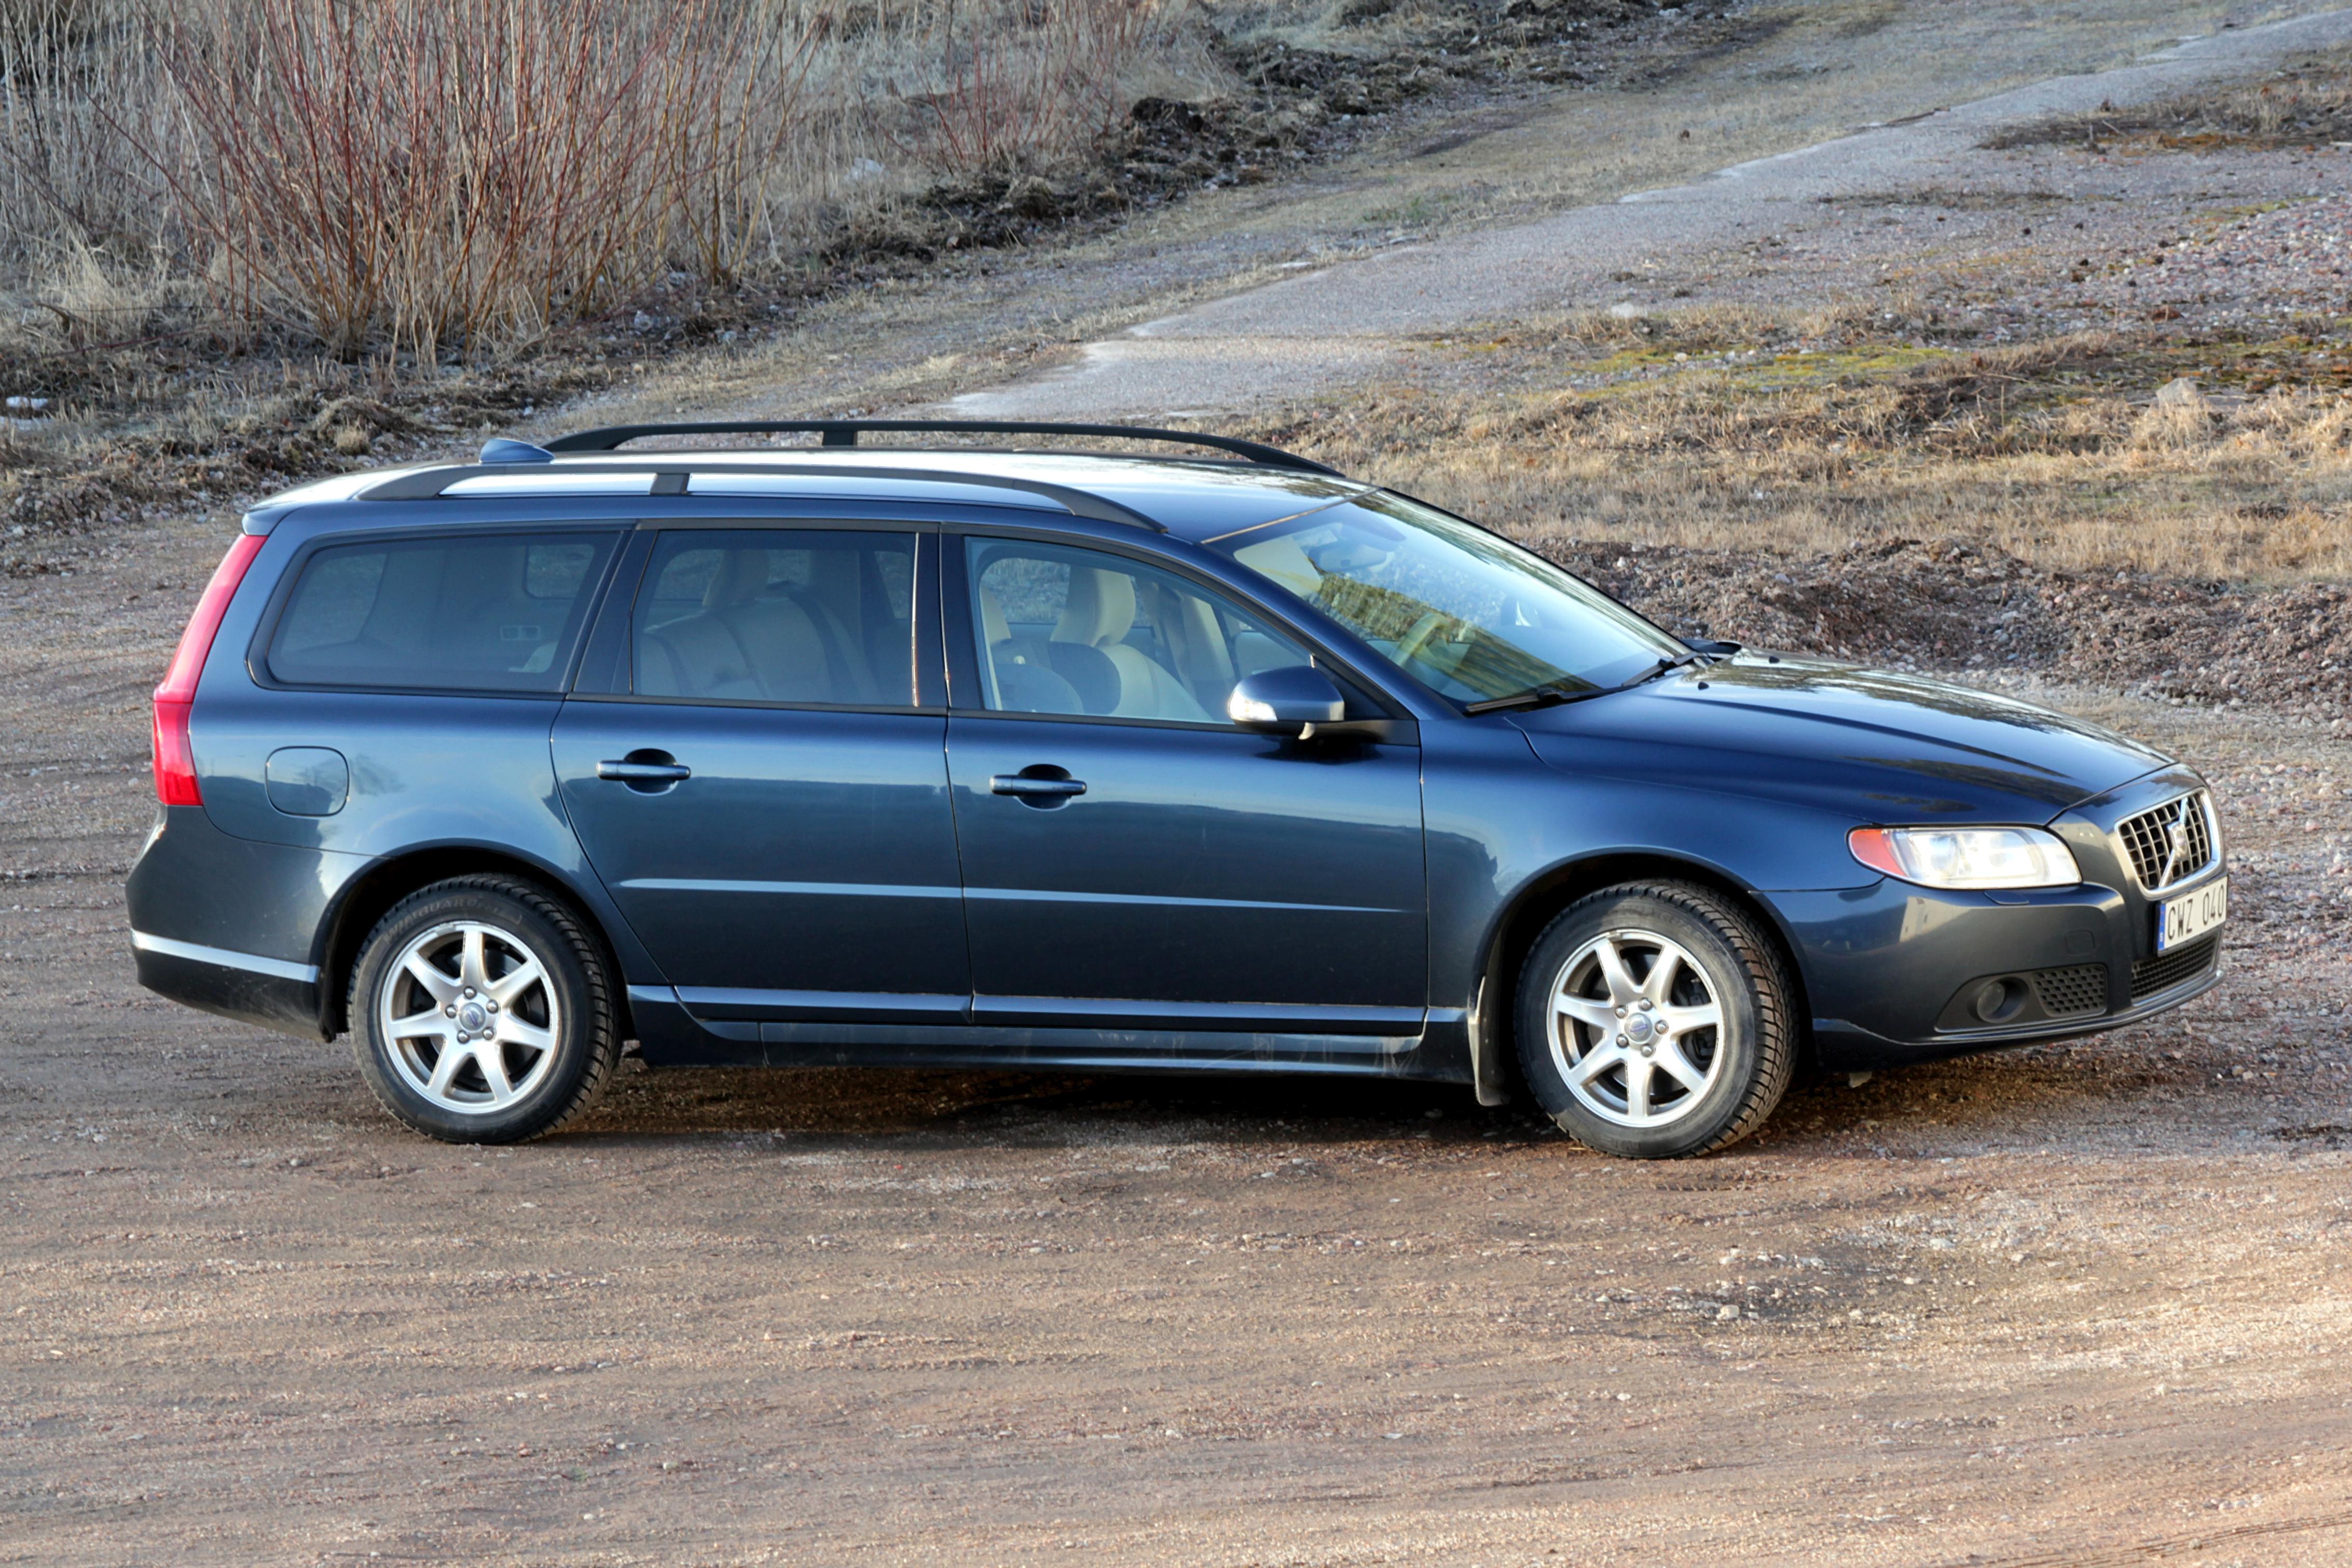 File:2008 Volvo V70, Avesta.jpg - Wikimedia Commons